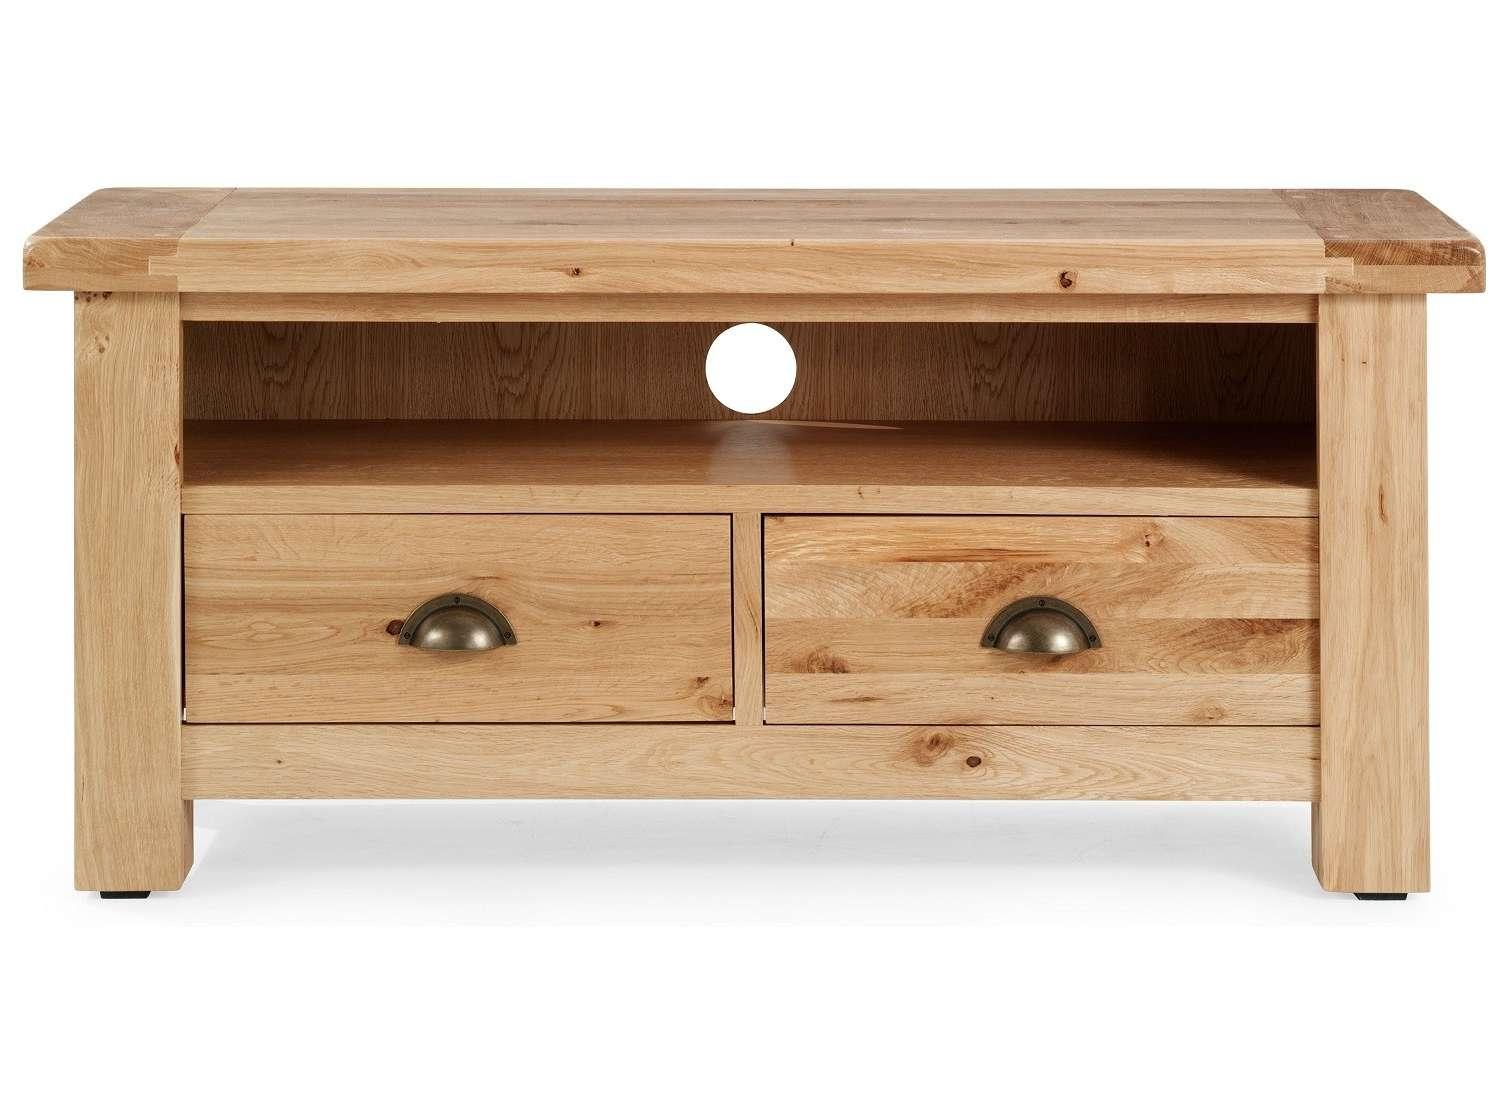 Normandy Rustic French Oak Tv Cabinet | Oak Furniture Uk Regarding Oak Tv Cabinets (View 5 of 20)